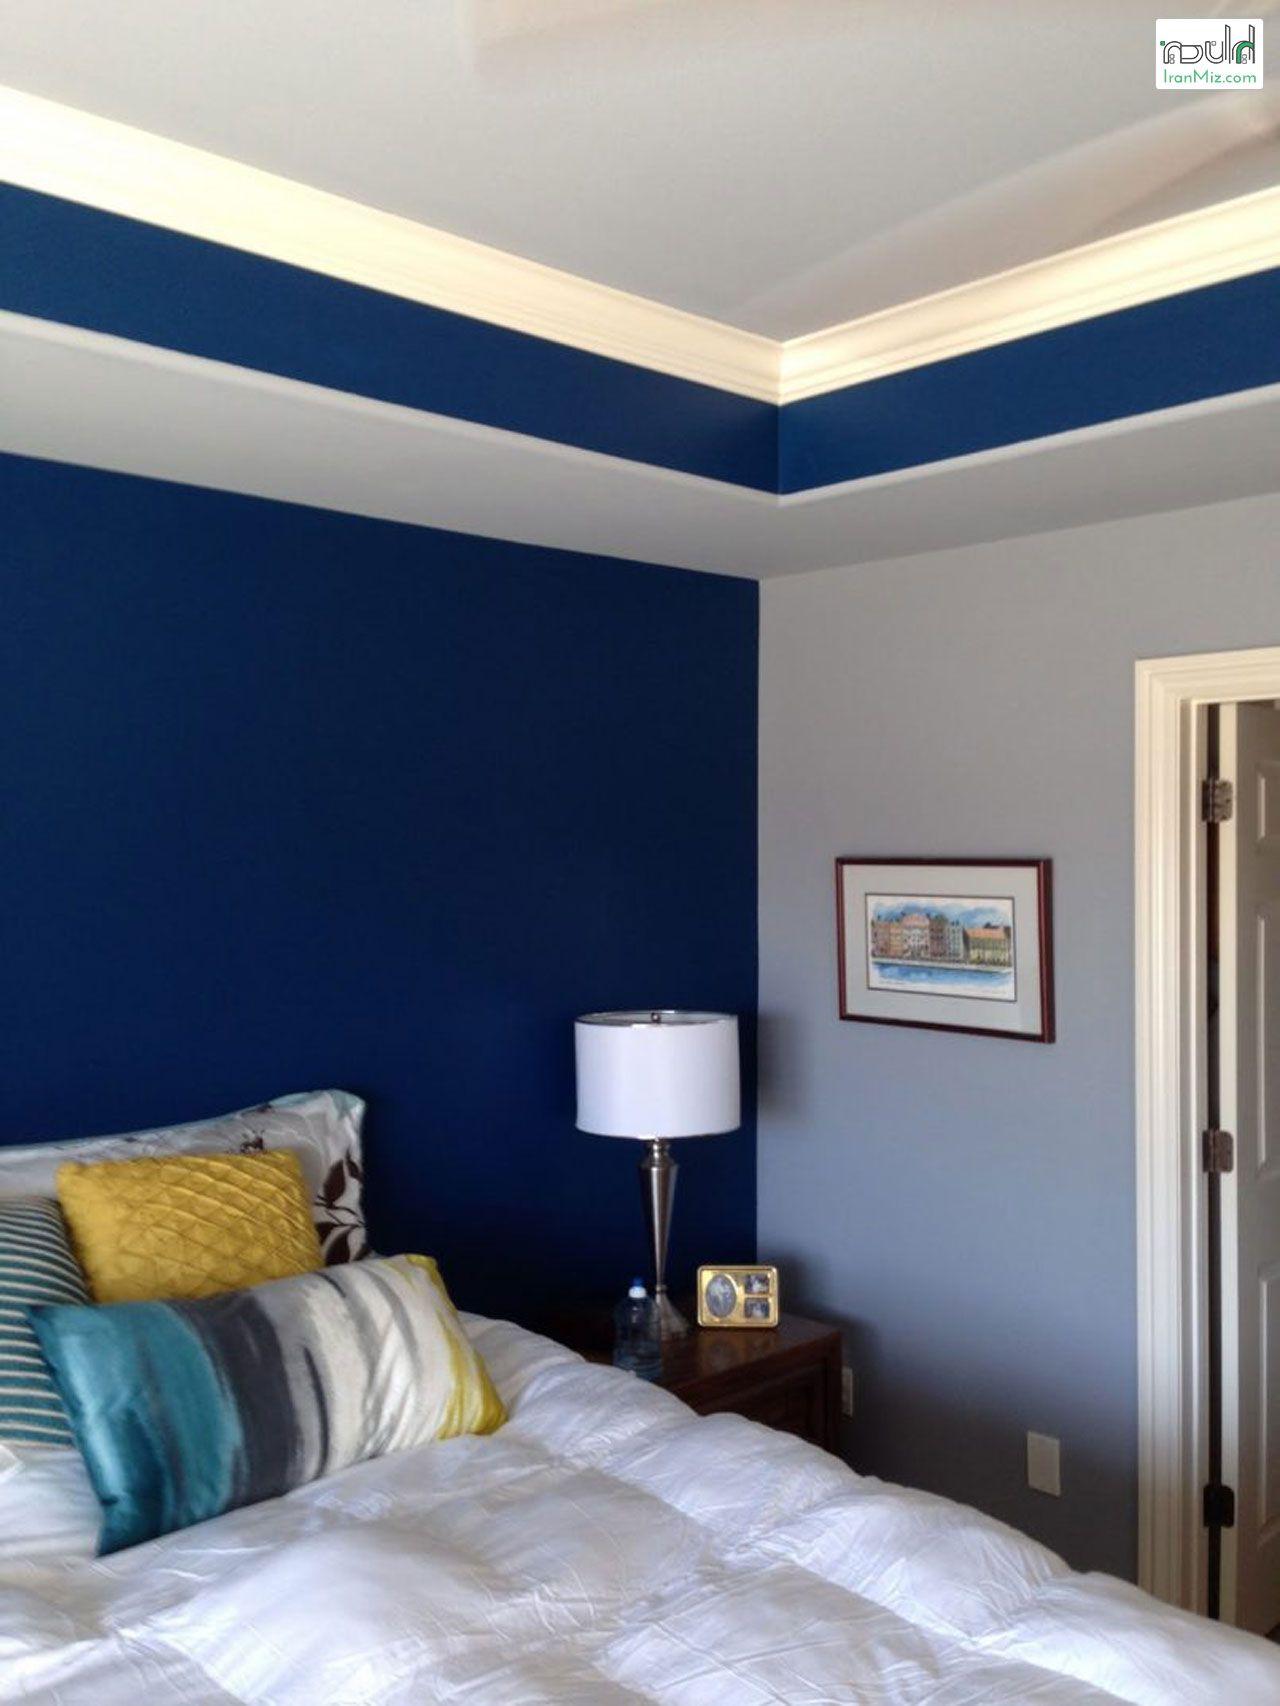 20 Bedroom Paint Ideas For Your Dream Bedroom Bedroom Color